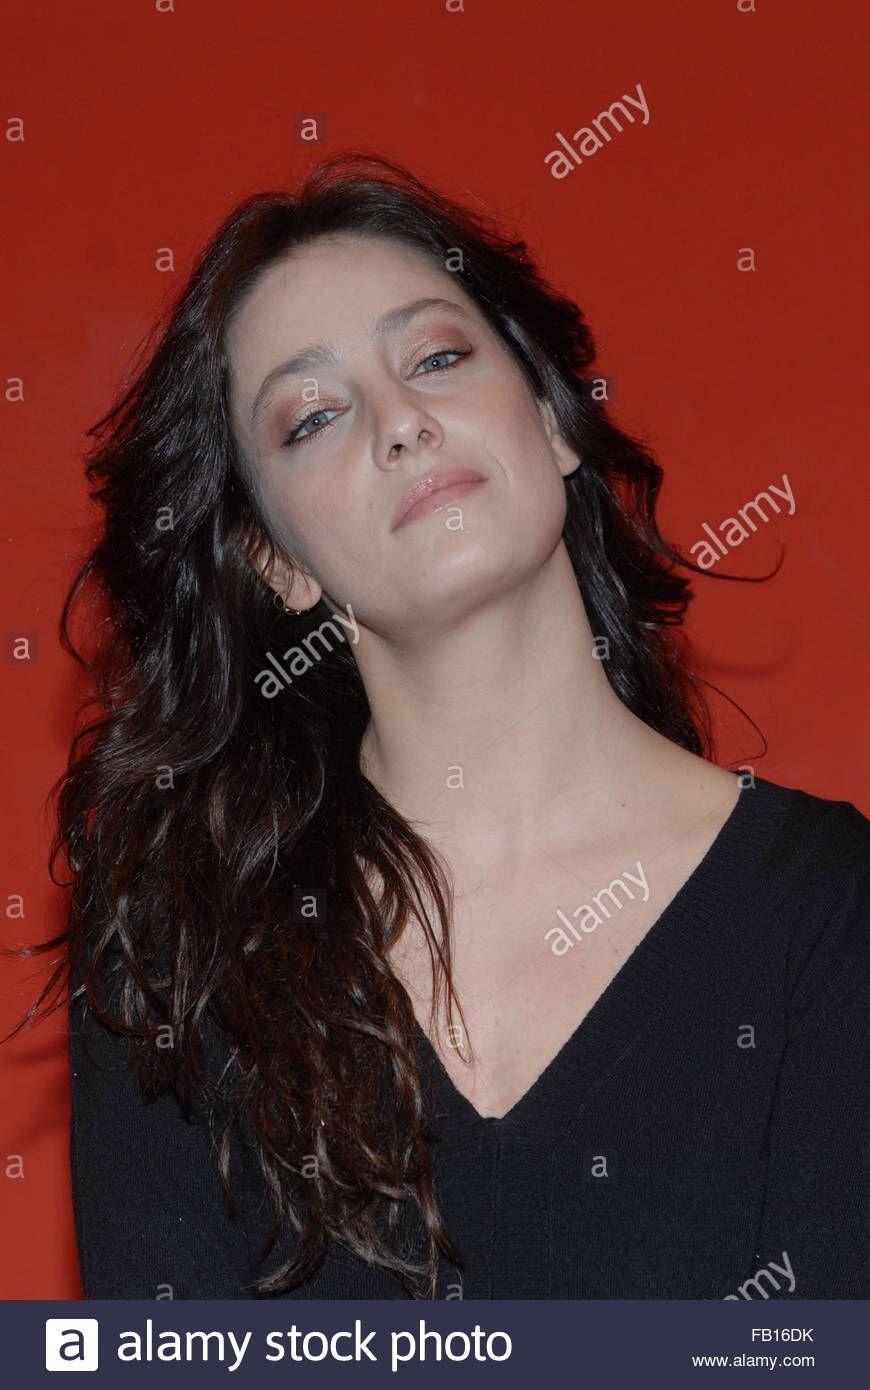 Giovanna Mezzogiorno (born 1974) Giovanna Mezzogiorno (born 1974) new photo